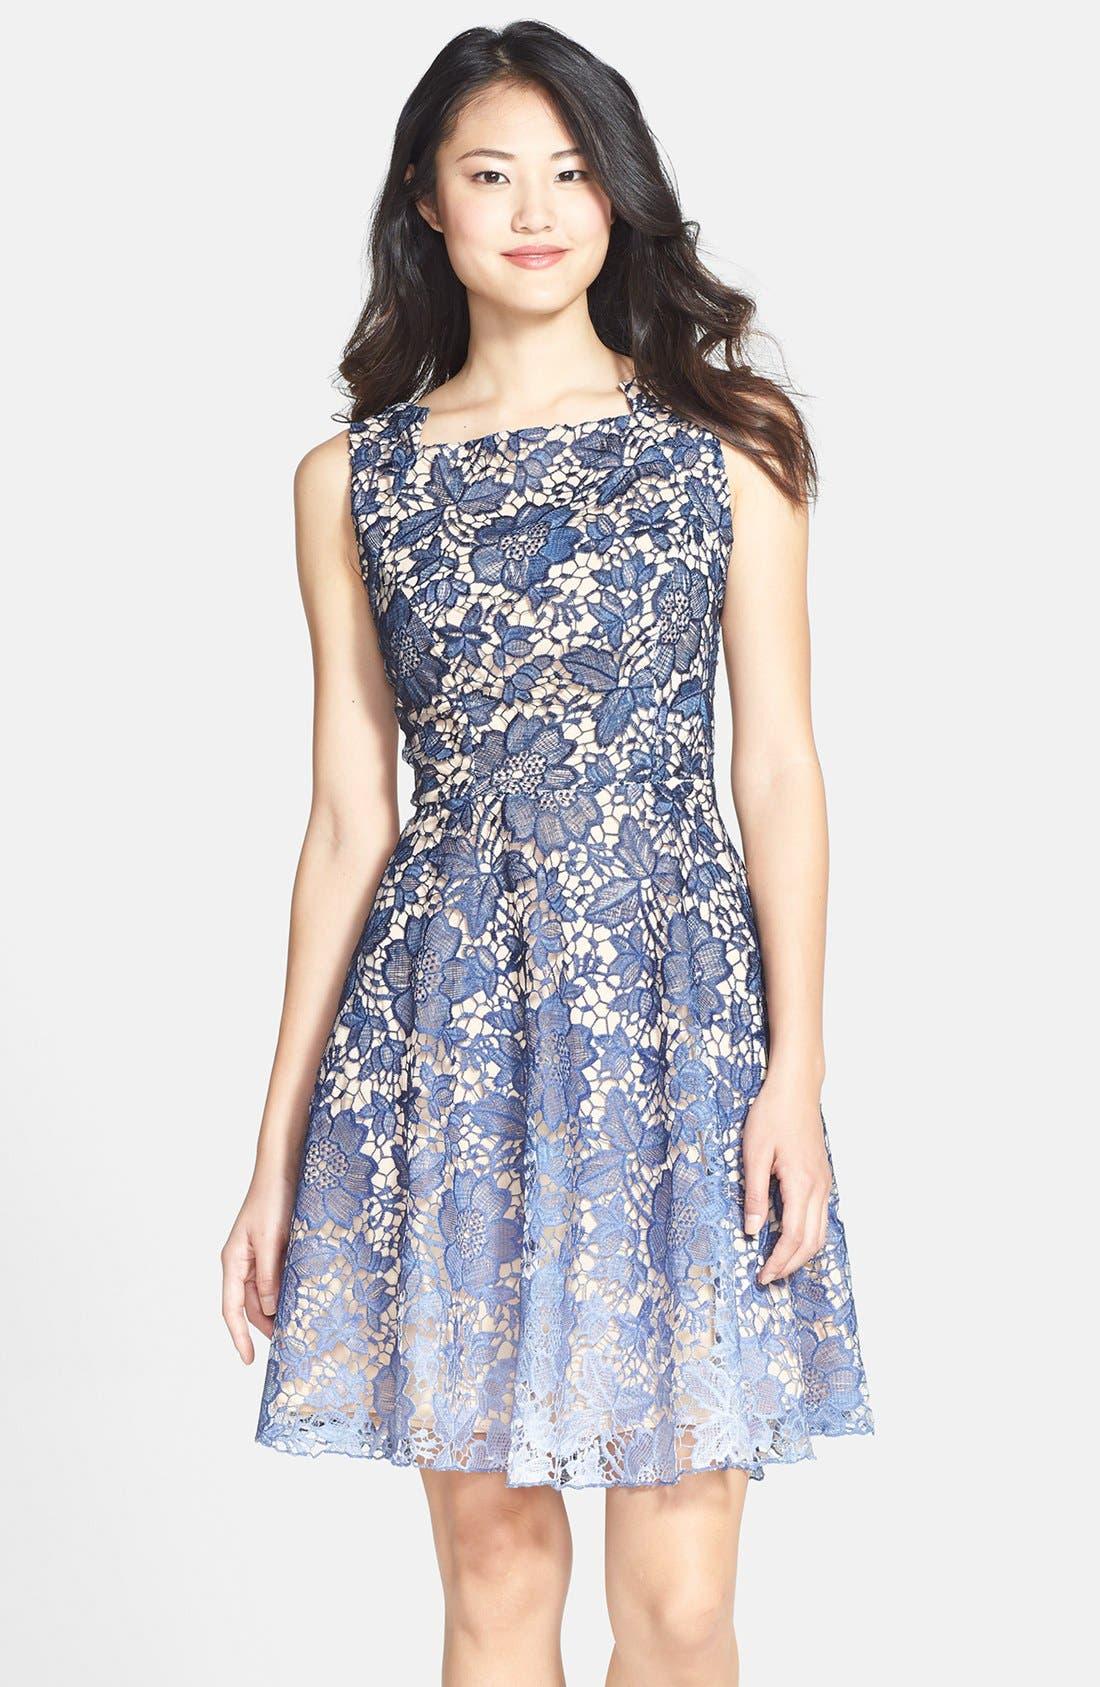 Alternate Image 1 Selected - Eva Franco 'Futura' Ombré Lace Fit & Flare Dress